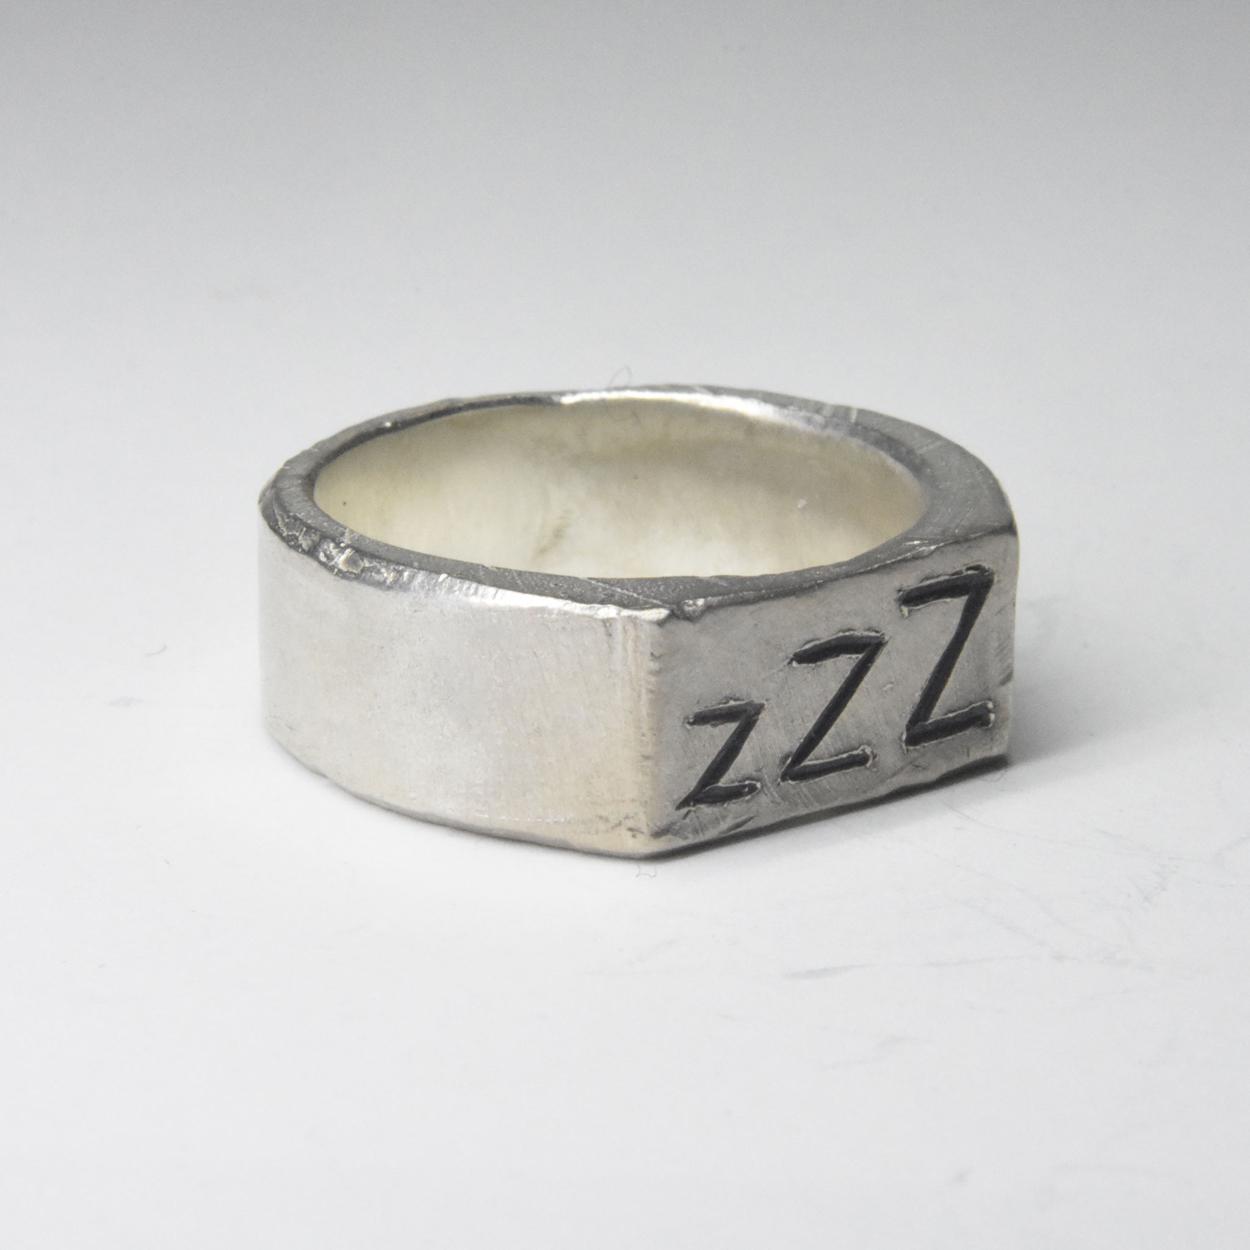 ZZZ signet ring